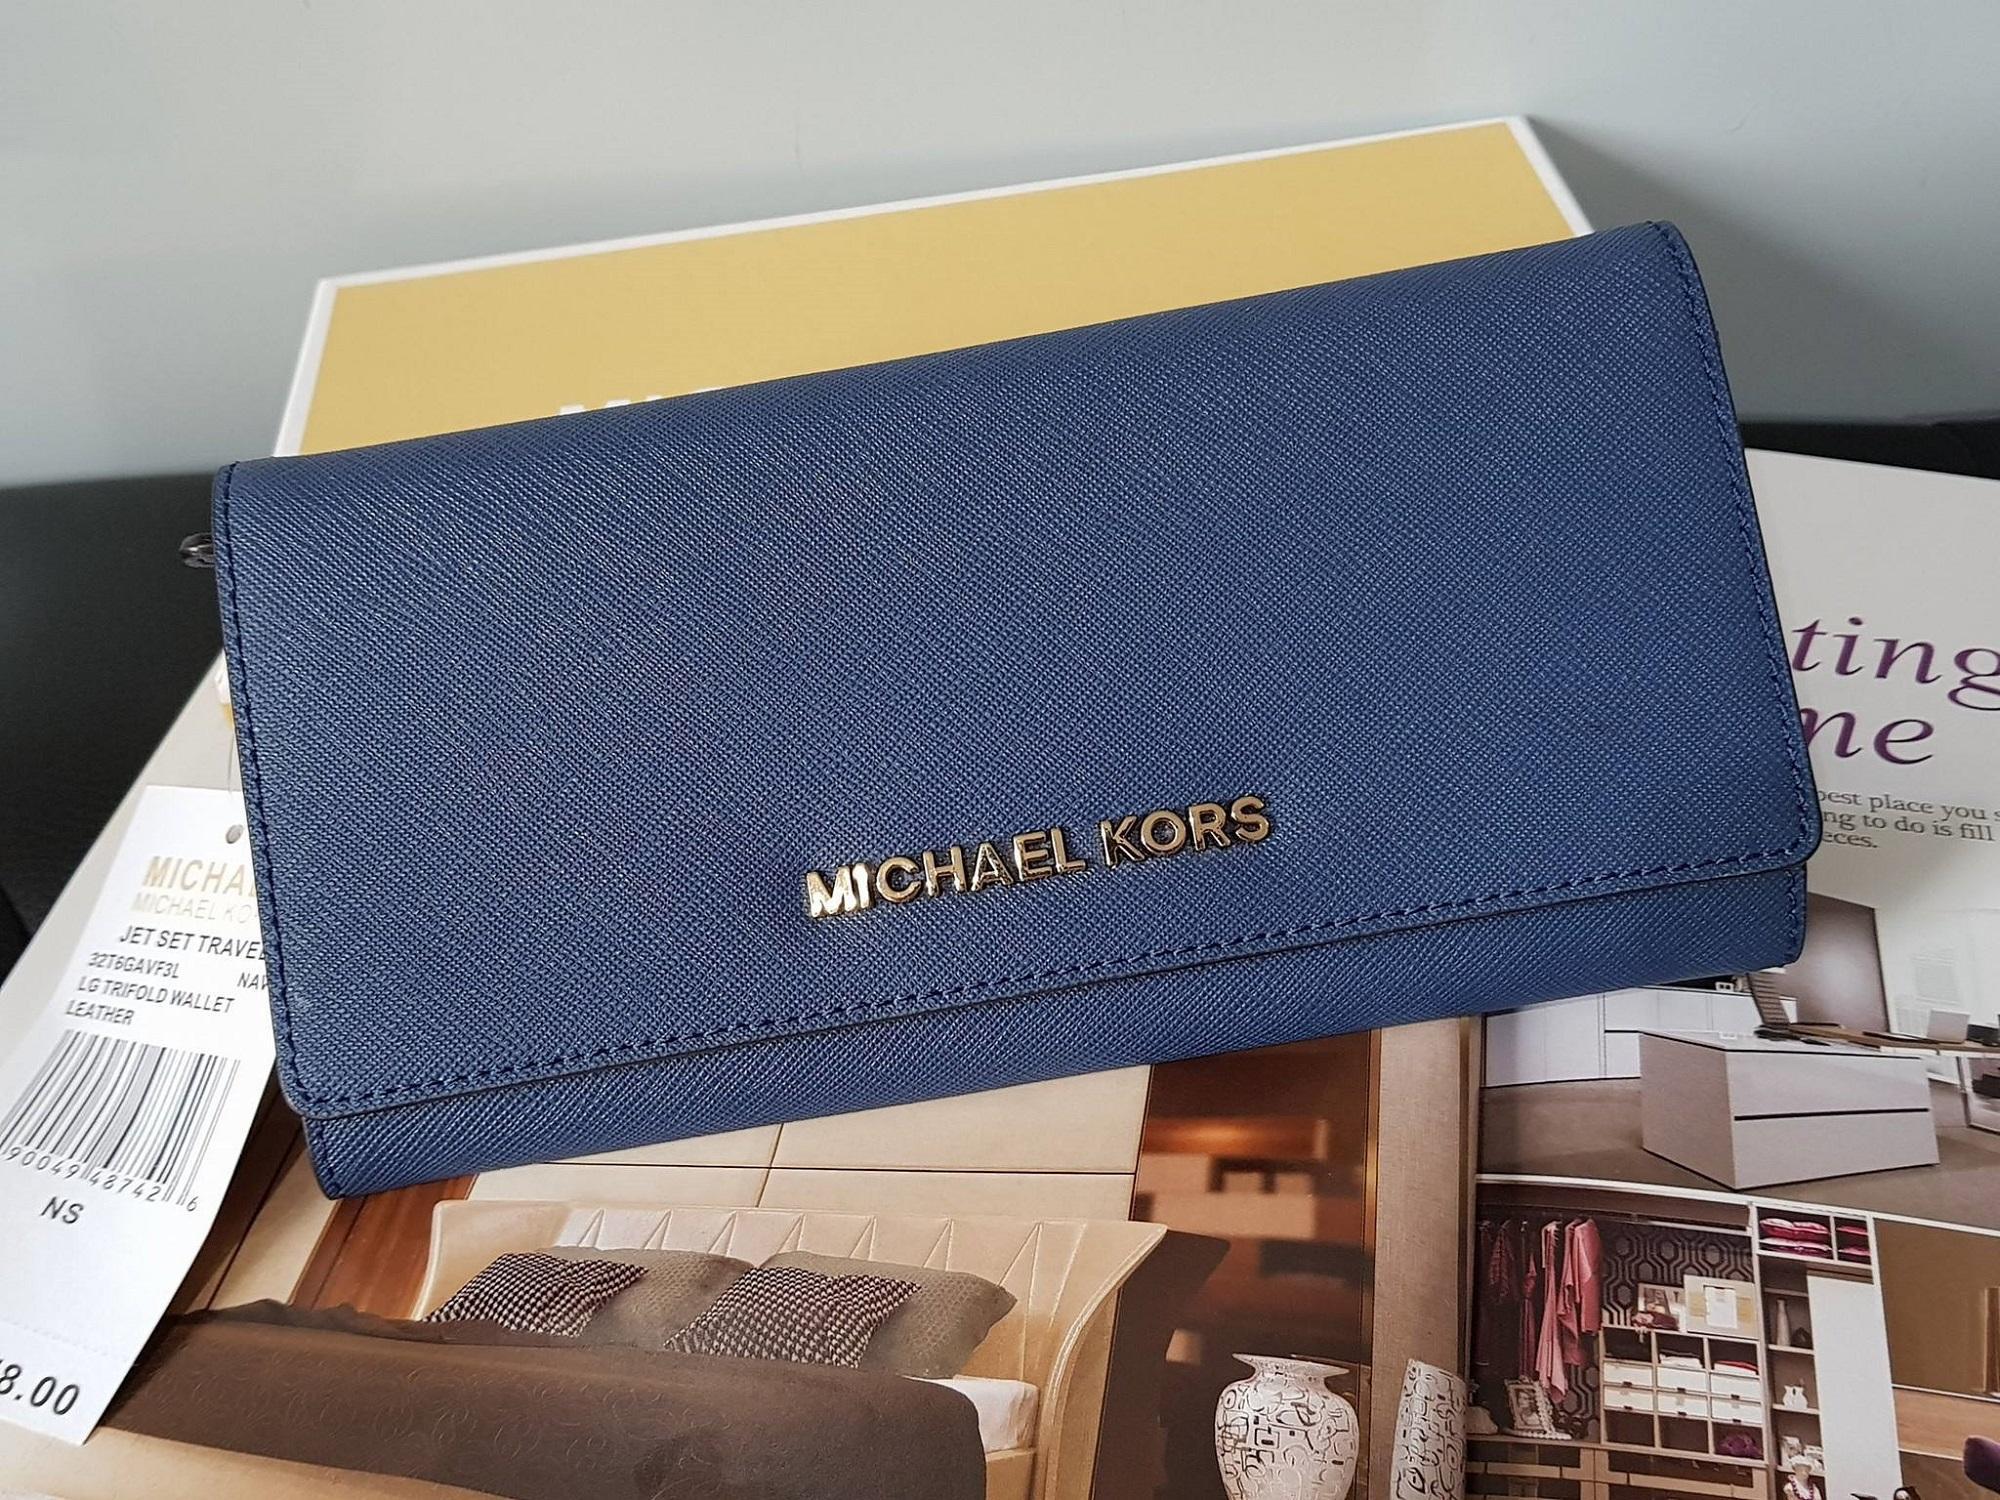 912e6276763a3e Michael Kors - Jet Set Travel Saffiano Leather Continental Wallet - Navy  Blue